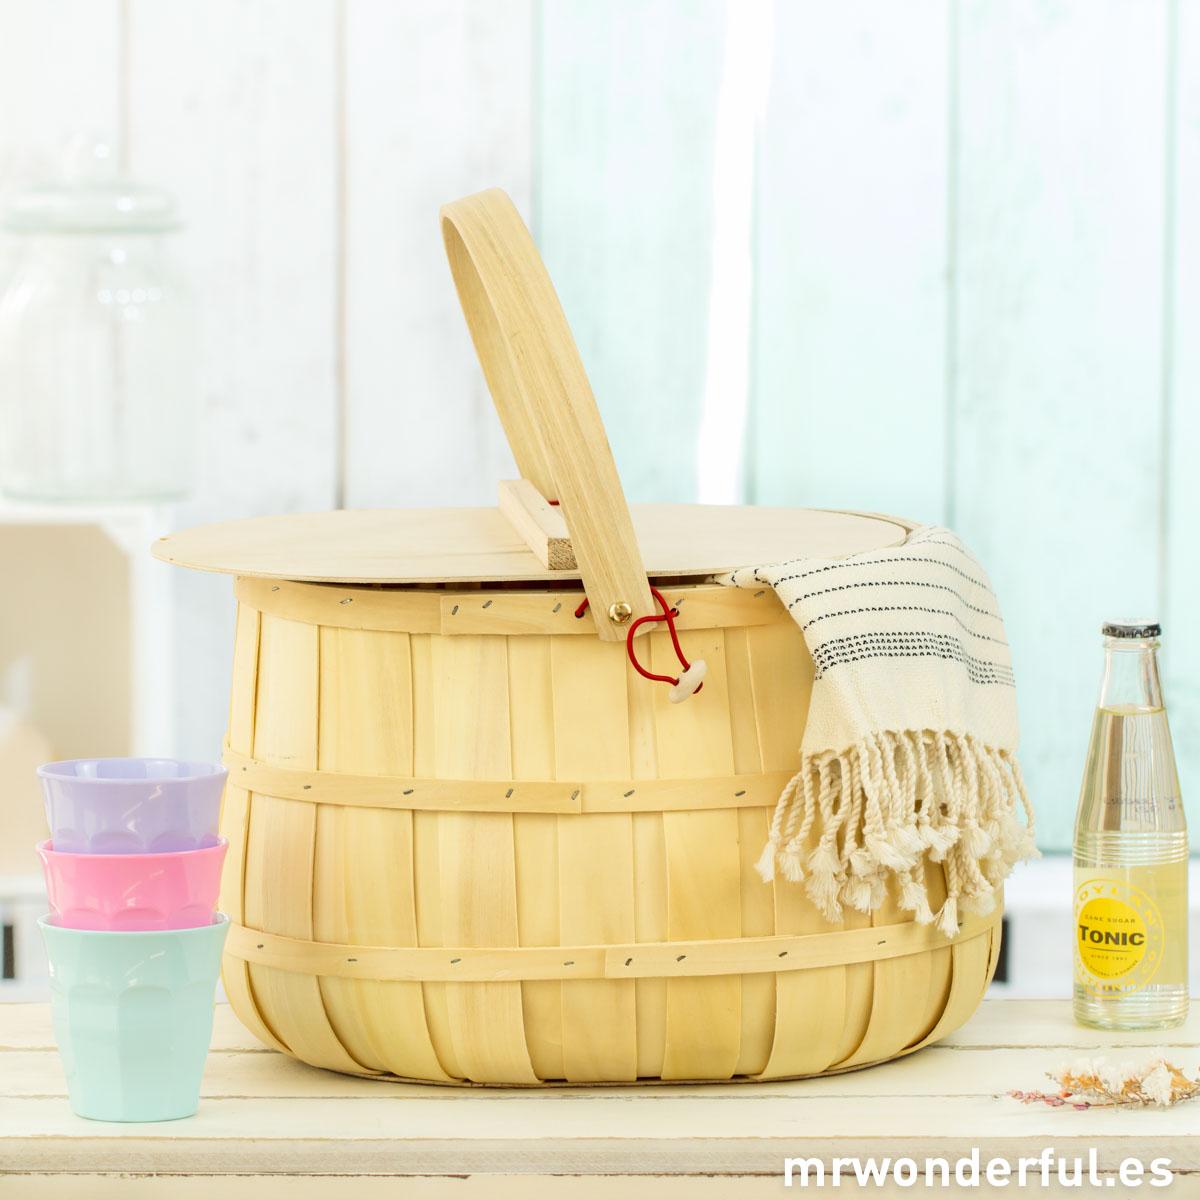 Mrwonderful_FU0505_cesta-madera-laminada-natural-picnic-1